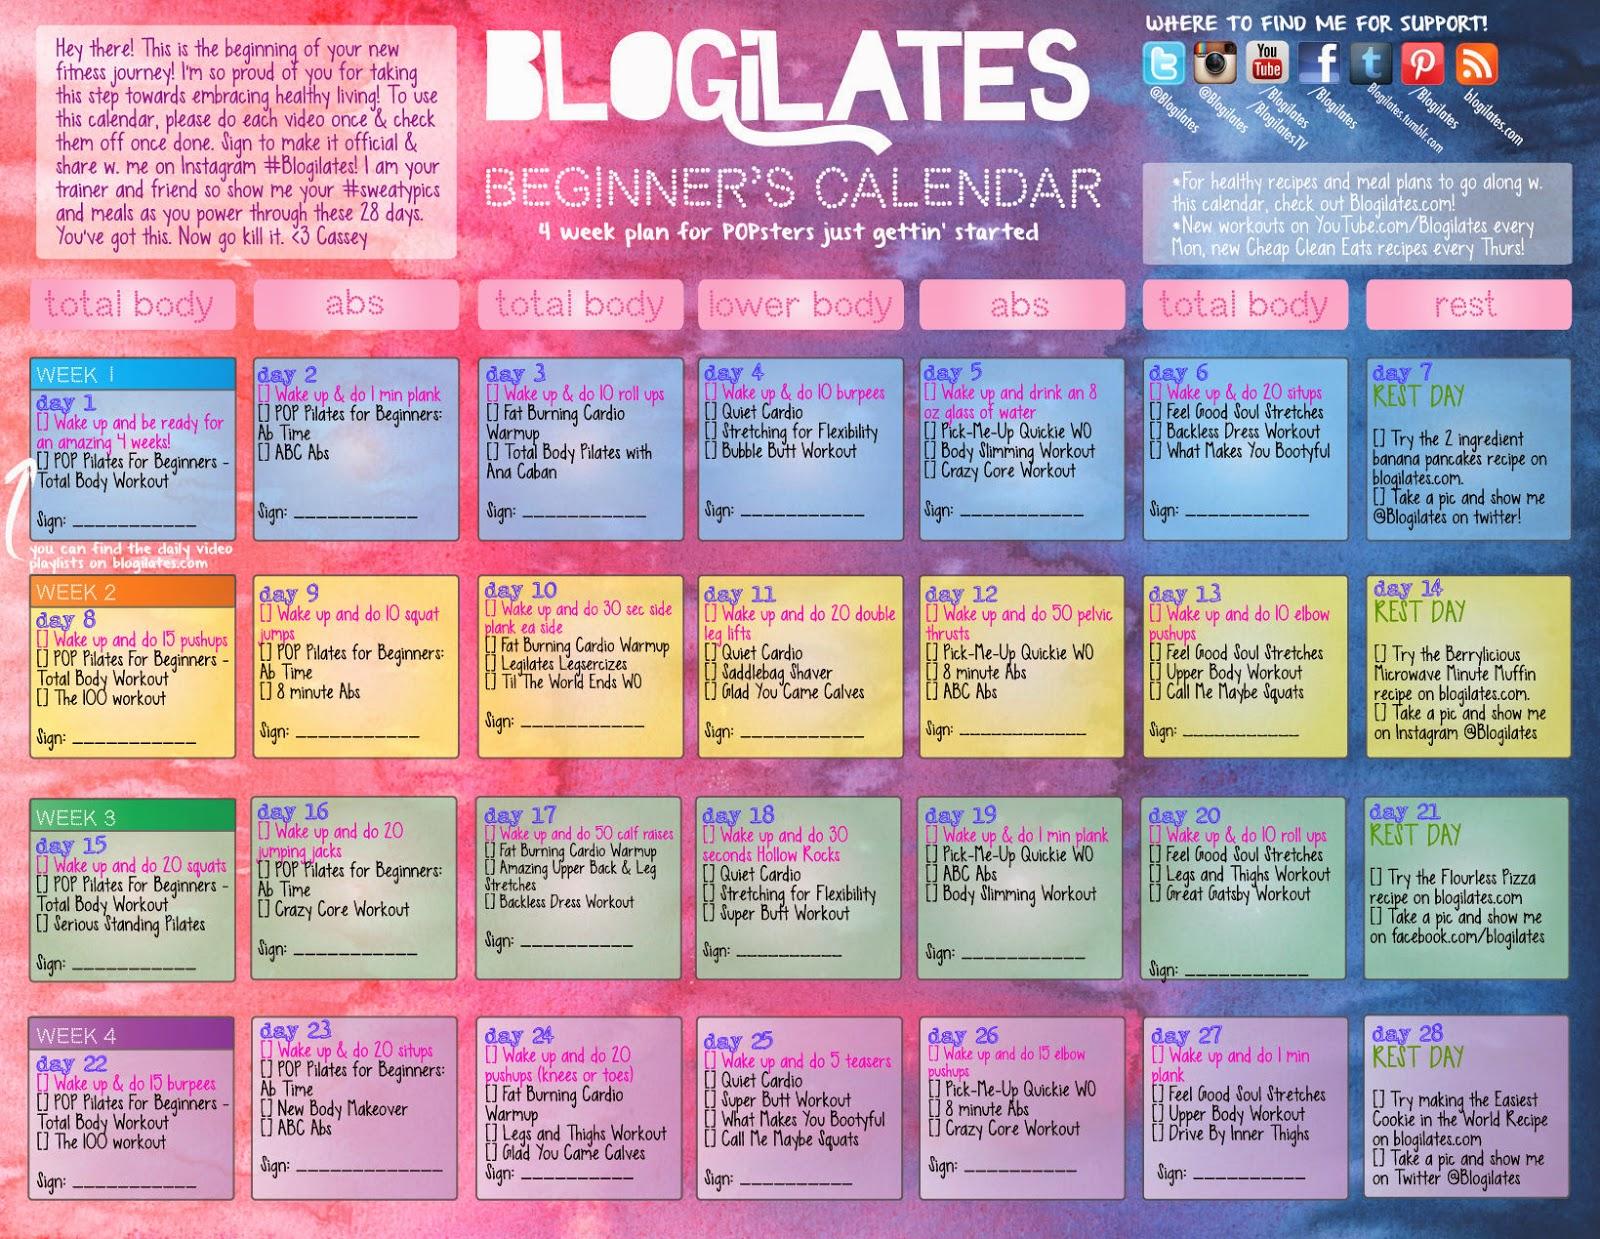 calendario freeletics